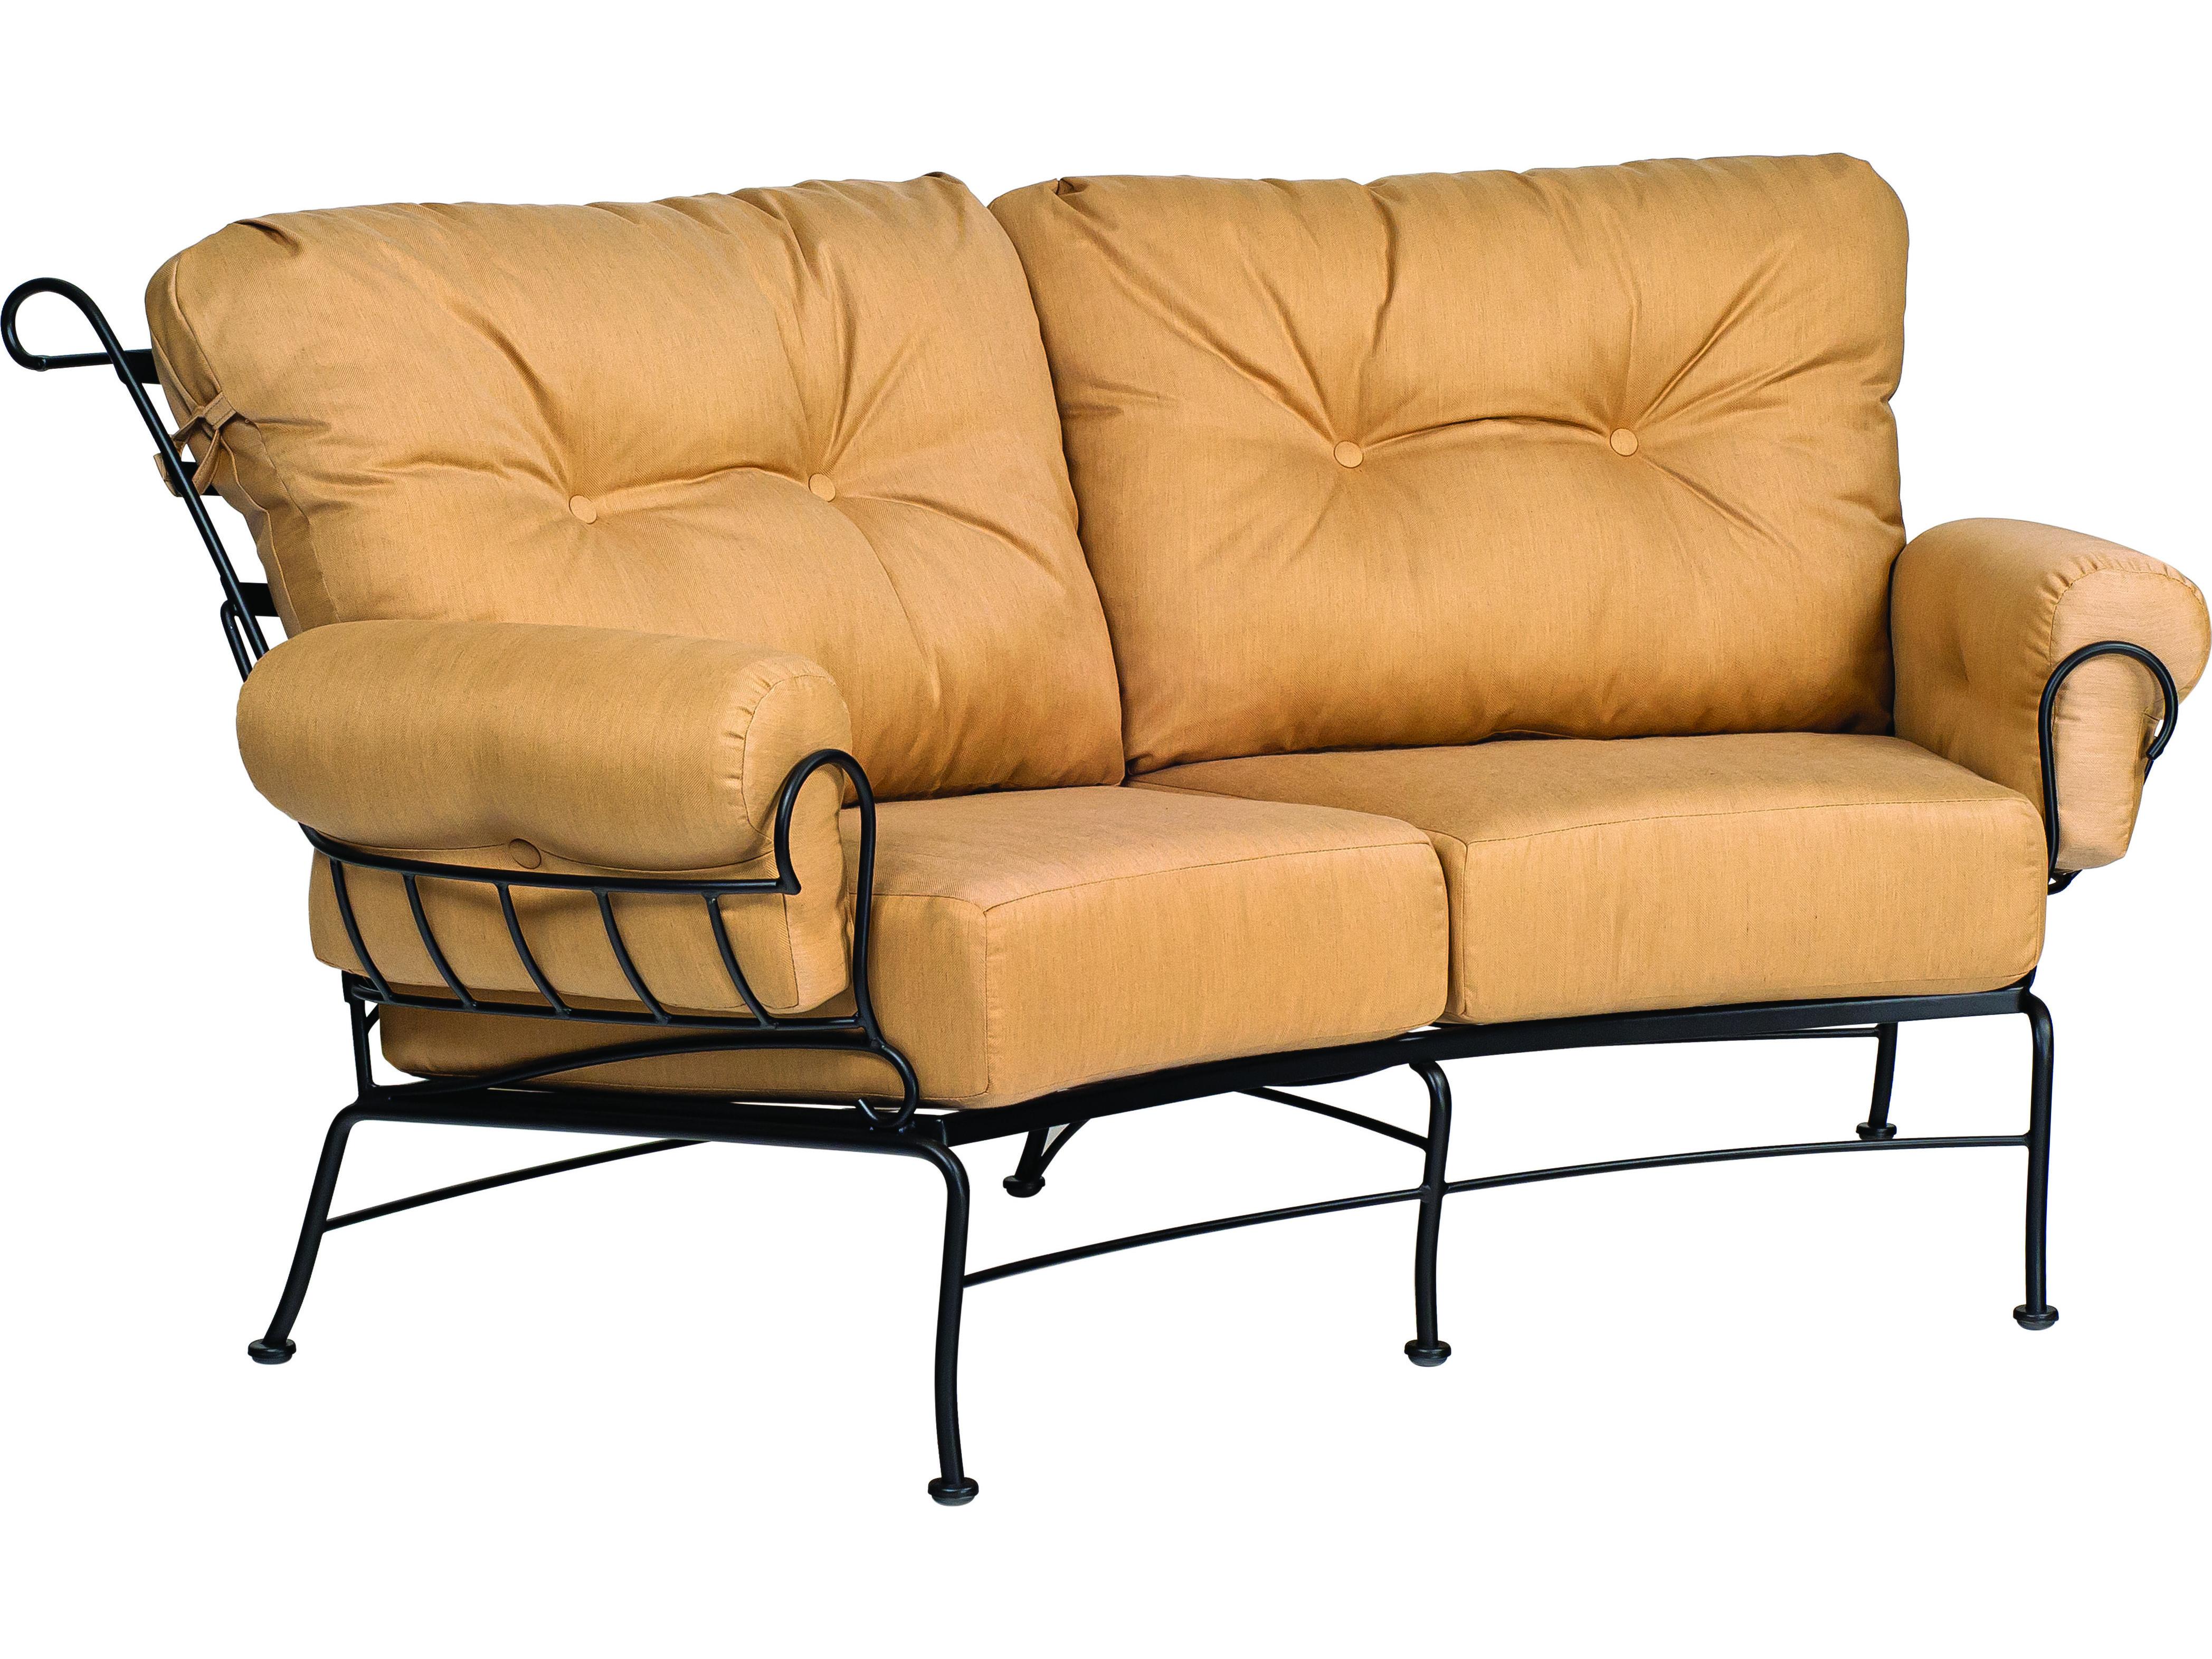 loveseat outdoor cushion replacement sa designsa clearance canada wicker pembrey cedar cushions island set